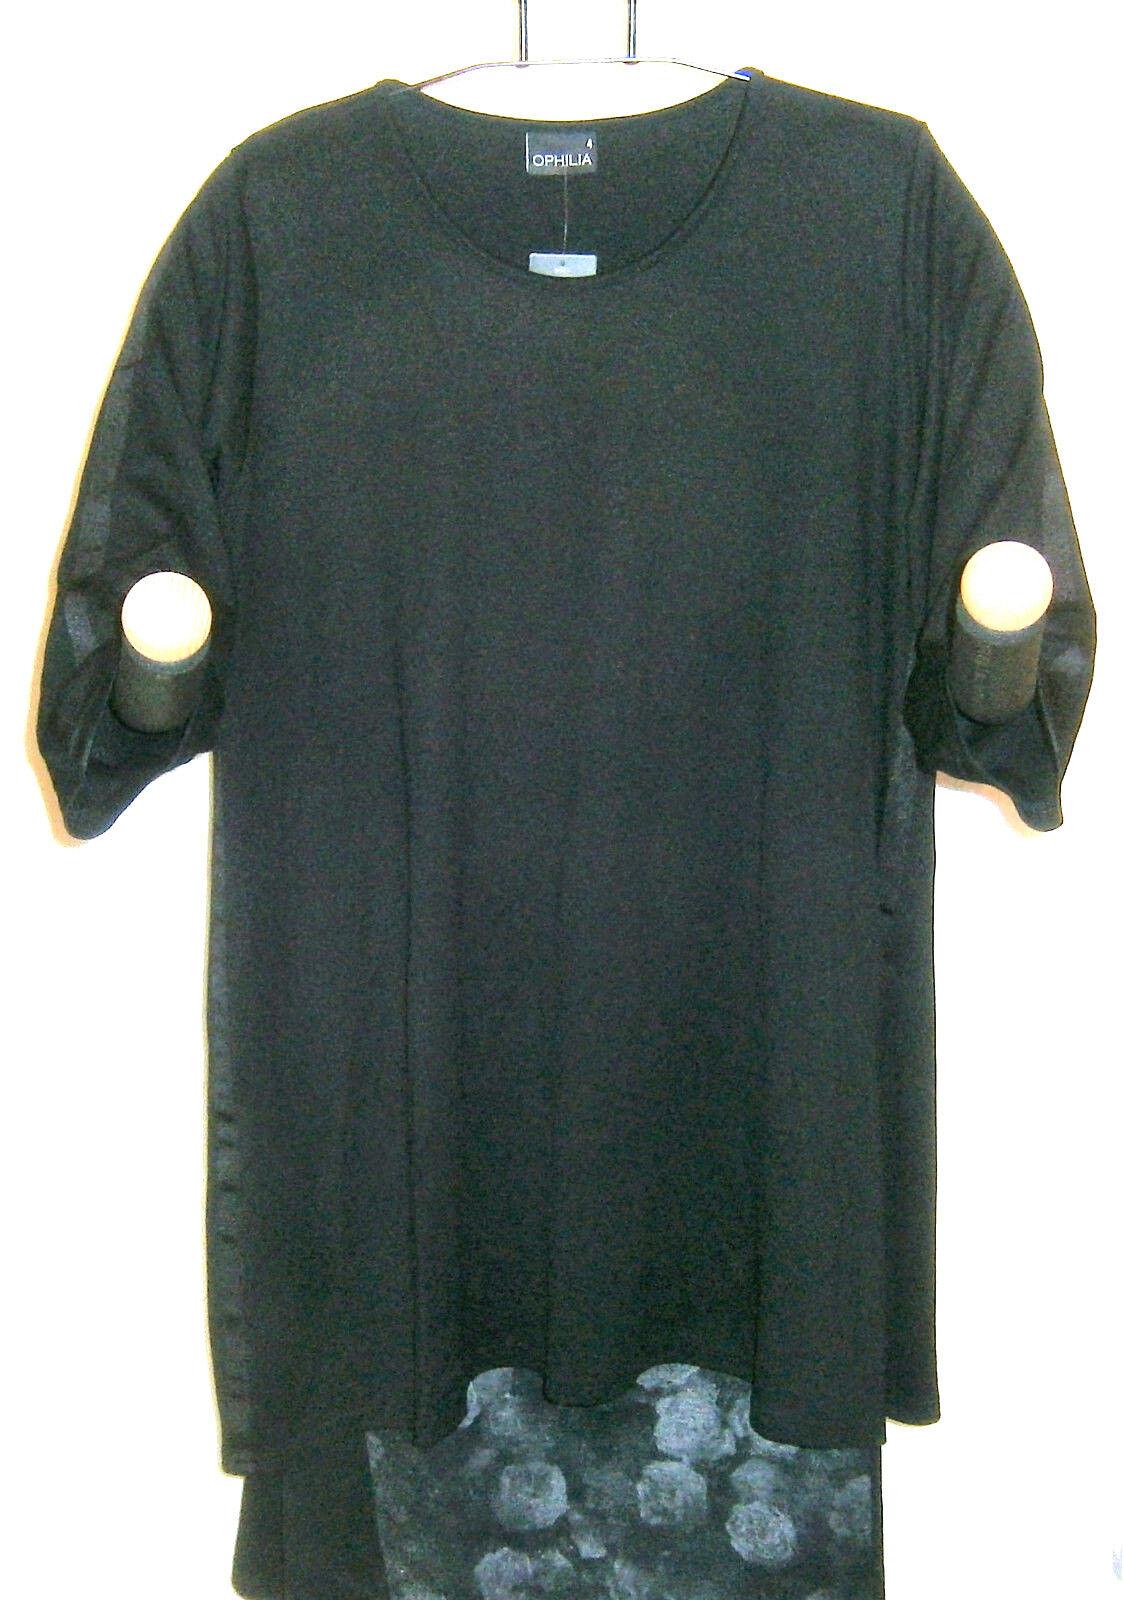 Ophilia  Lagenlook Kleid Tunika black A-Linie 3 4 Arm Gr. 4 (46 - 48) NEU